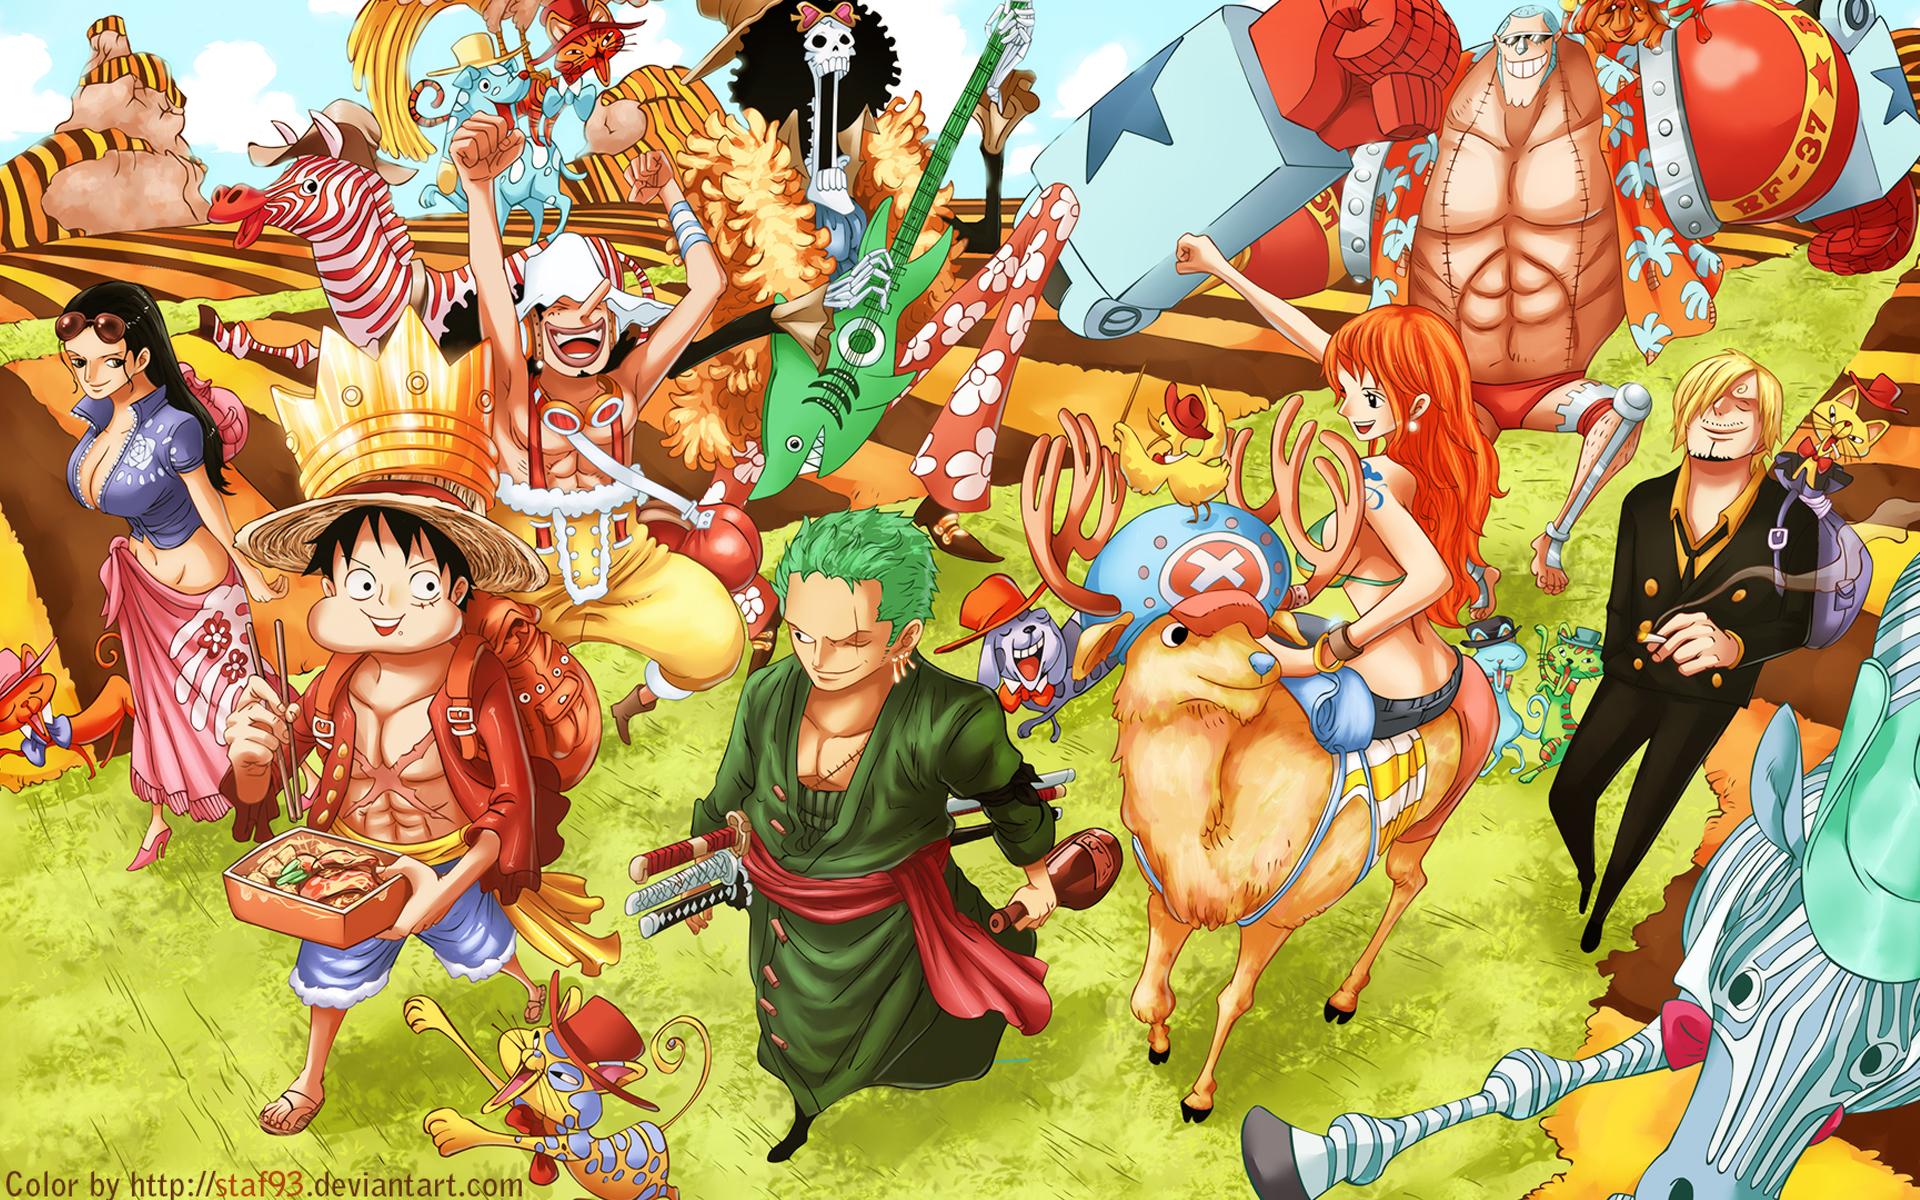 Samehadaku One Piece 810 Sub Indo 1080p